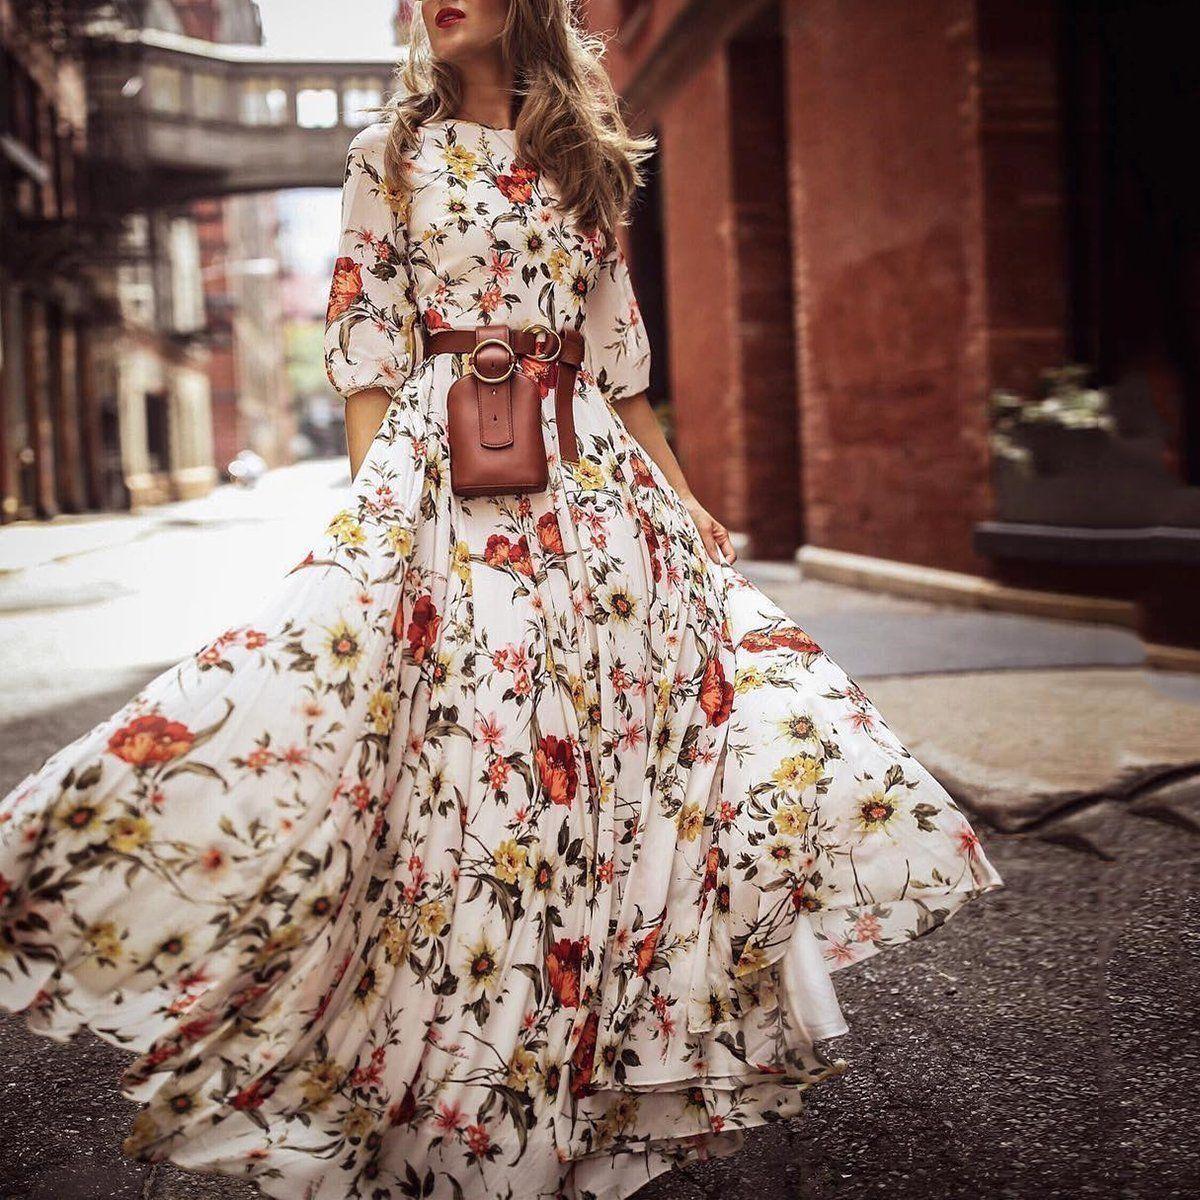 Stylish Elegant Floral Print Half Sleeve Maxi Dresses Maxi Dress Print Chiffon Maxi Dress Maxi Dress With Sleeves [ 1200 x 1200 Pixel ]